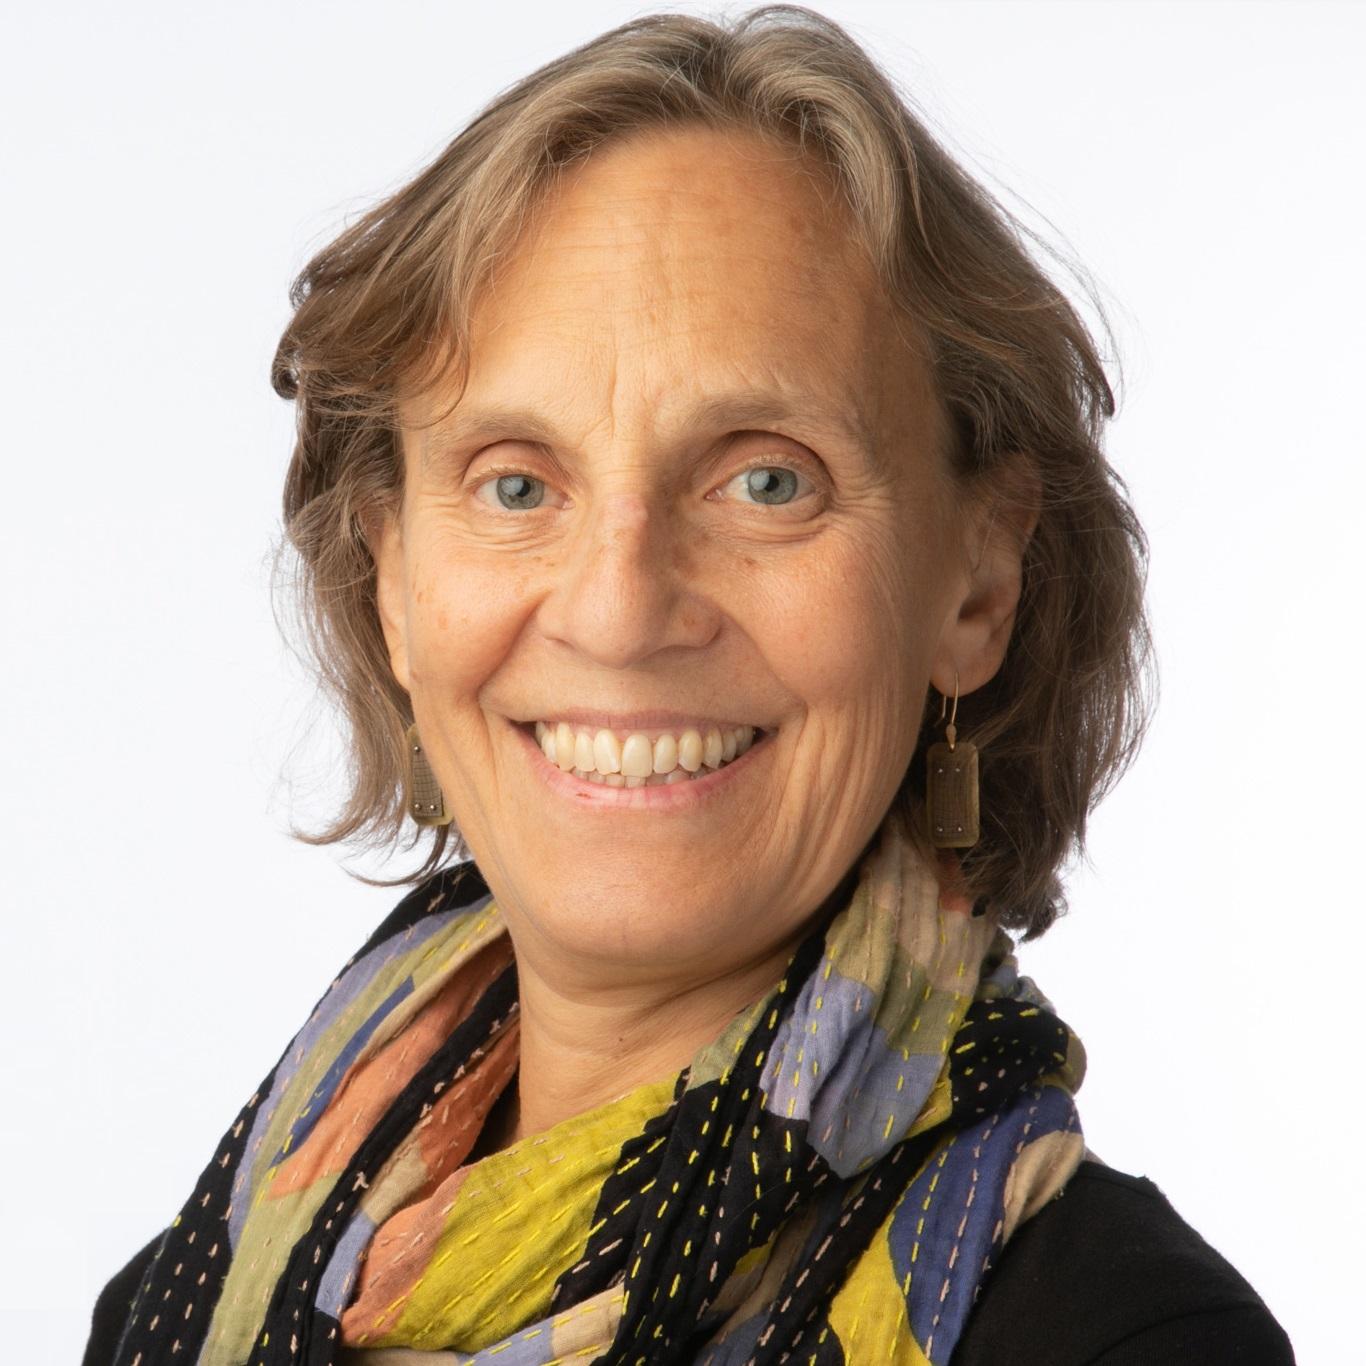 Anita Weinberg, Director, ChildLaw Policy Institute, Loyola University Chicago School of Law